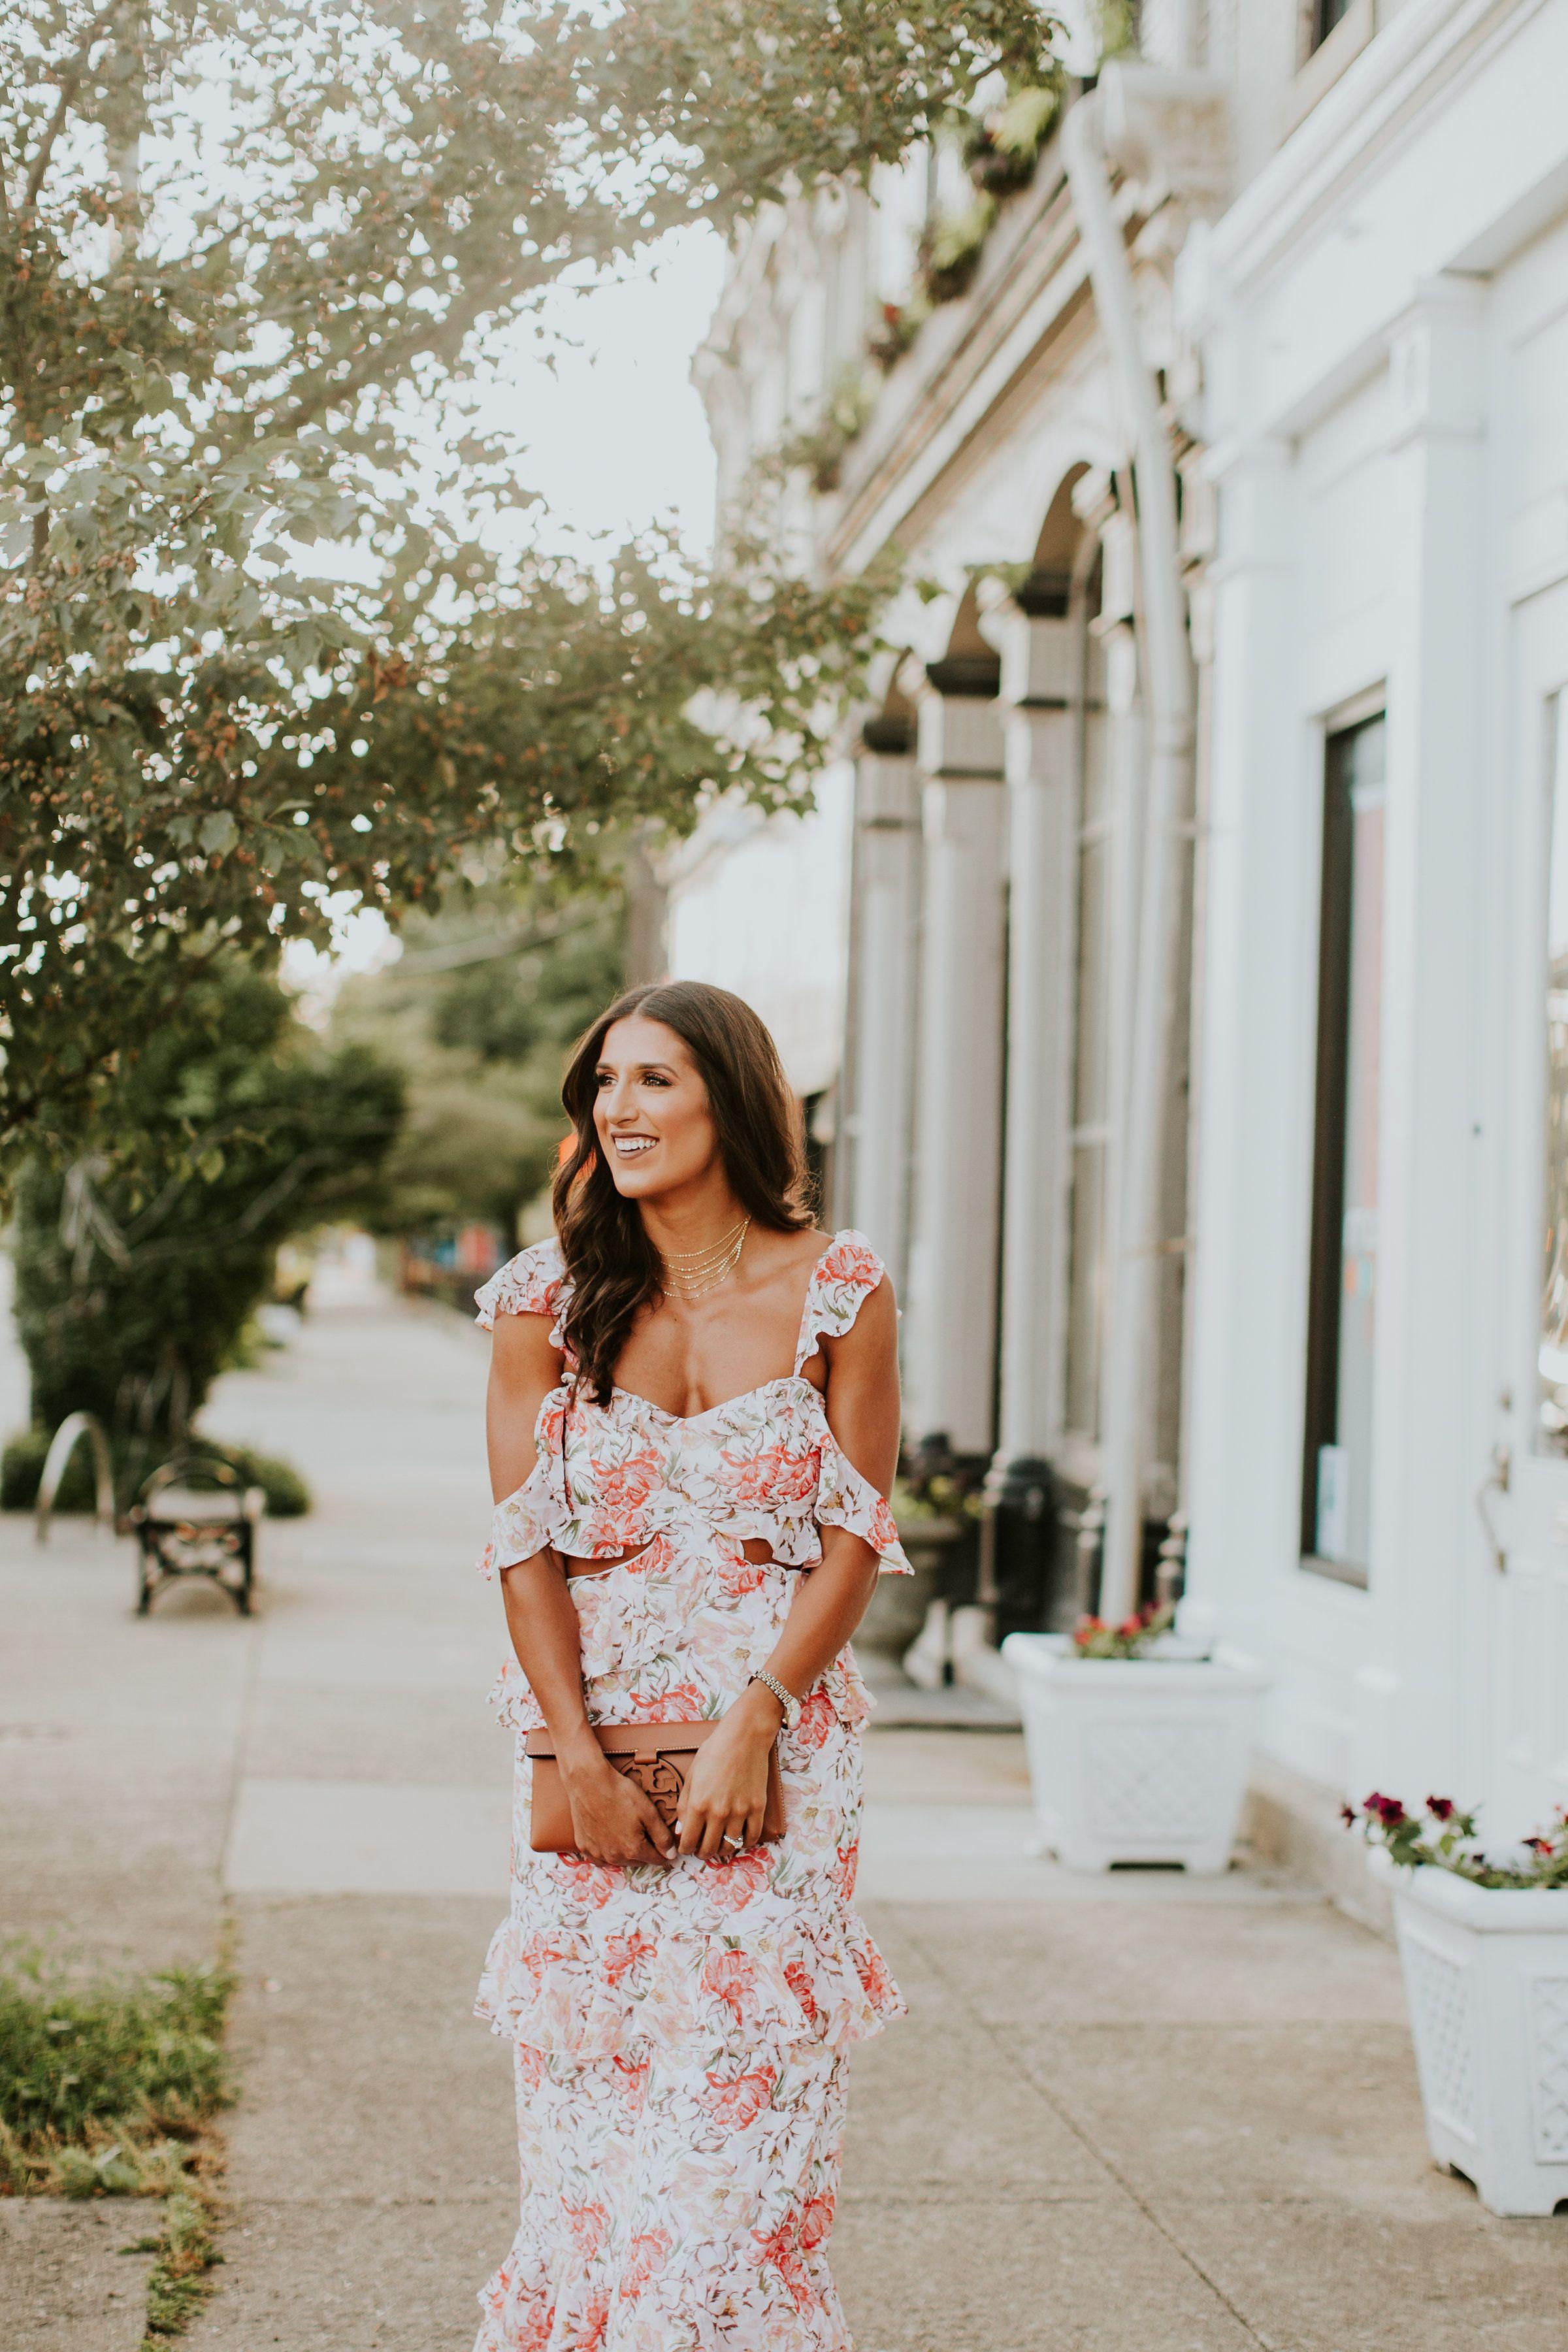 Ruffle Maxi Dress Pinterest Dress Wedding Guests Maxi Dresses